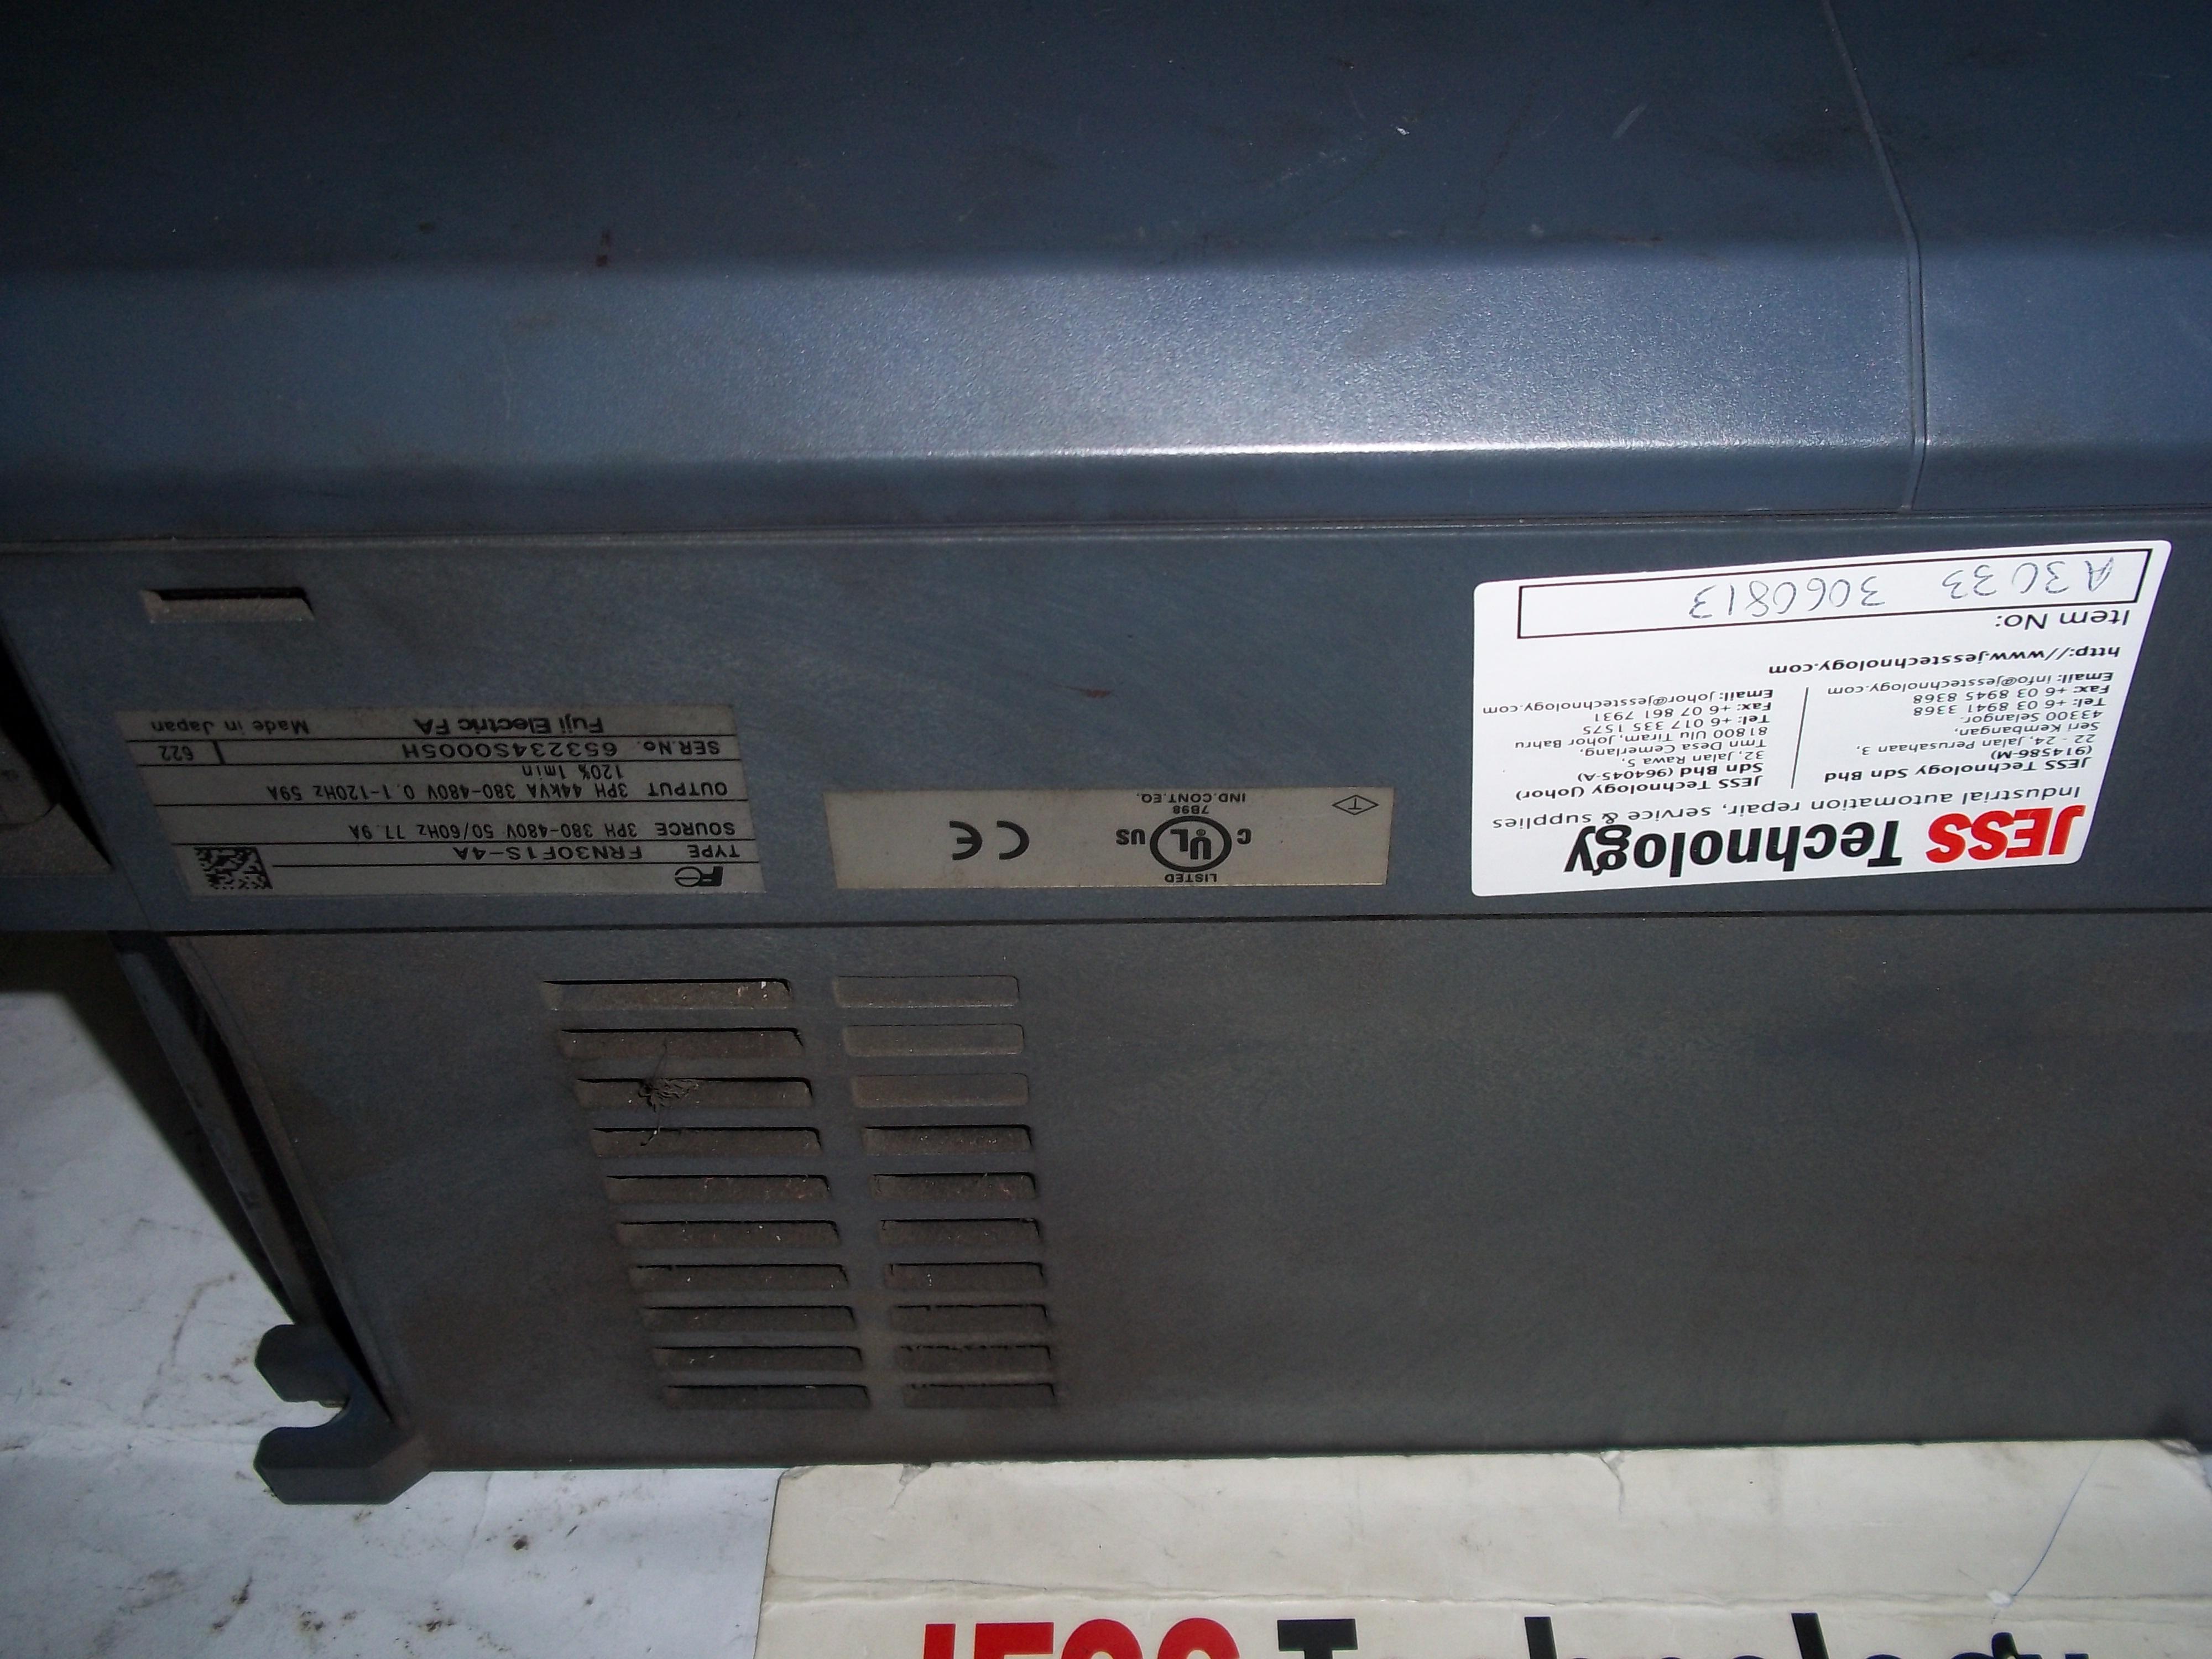 Repair FRN30F1S-4A FUJI FRENIC-ECO FUJI FRENIC - ECO  in Malaysia, Singapore, Thailand, Indonesia